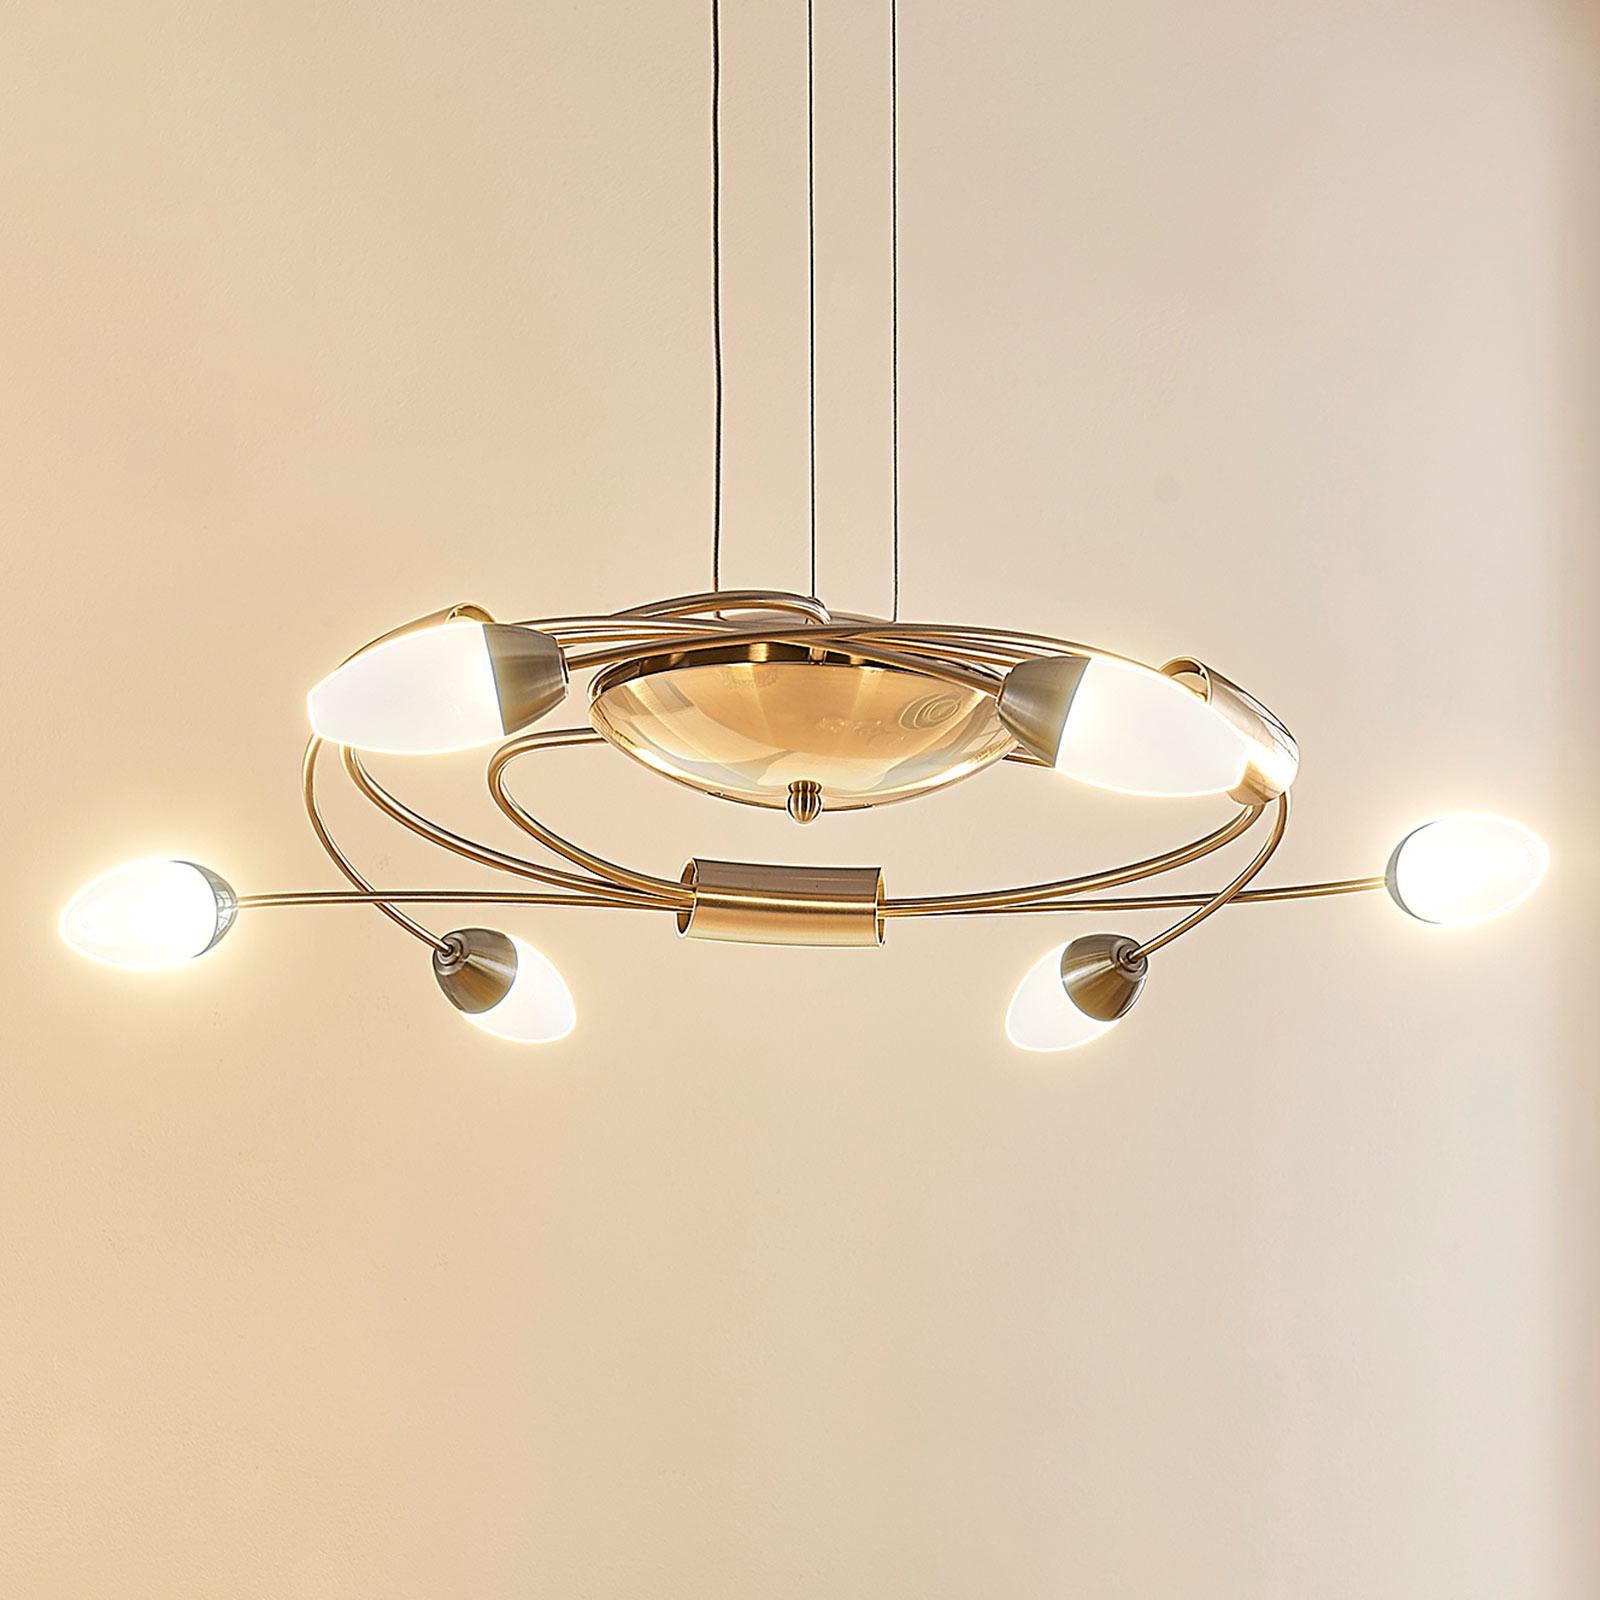 LED-hengelampe Deyan, dimbar, 6 lyskilder